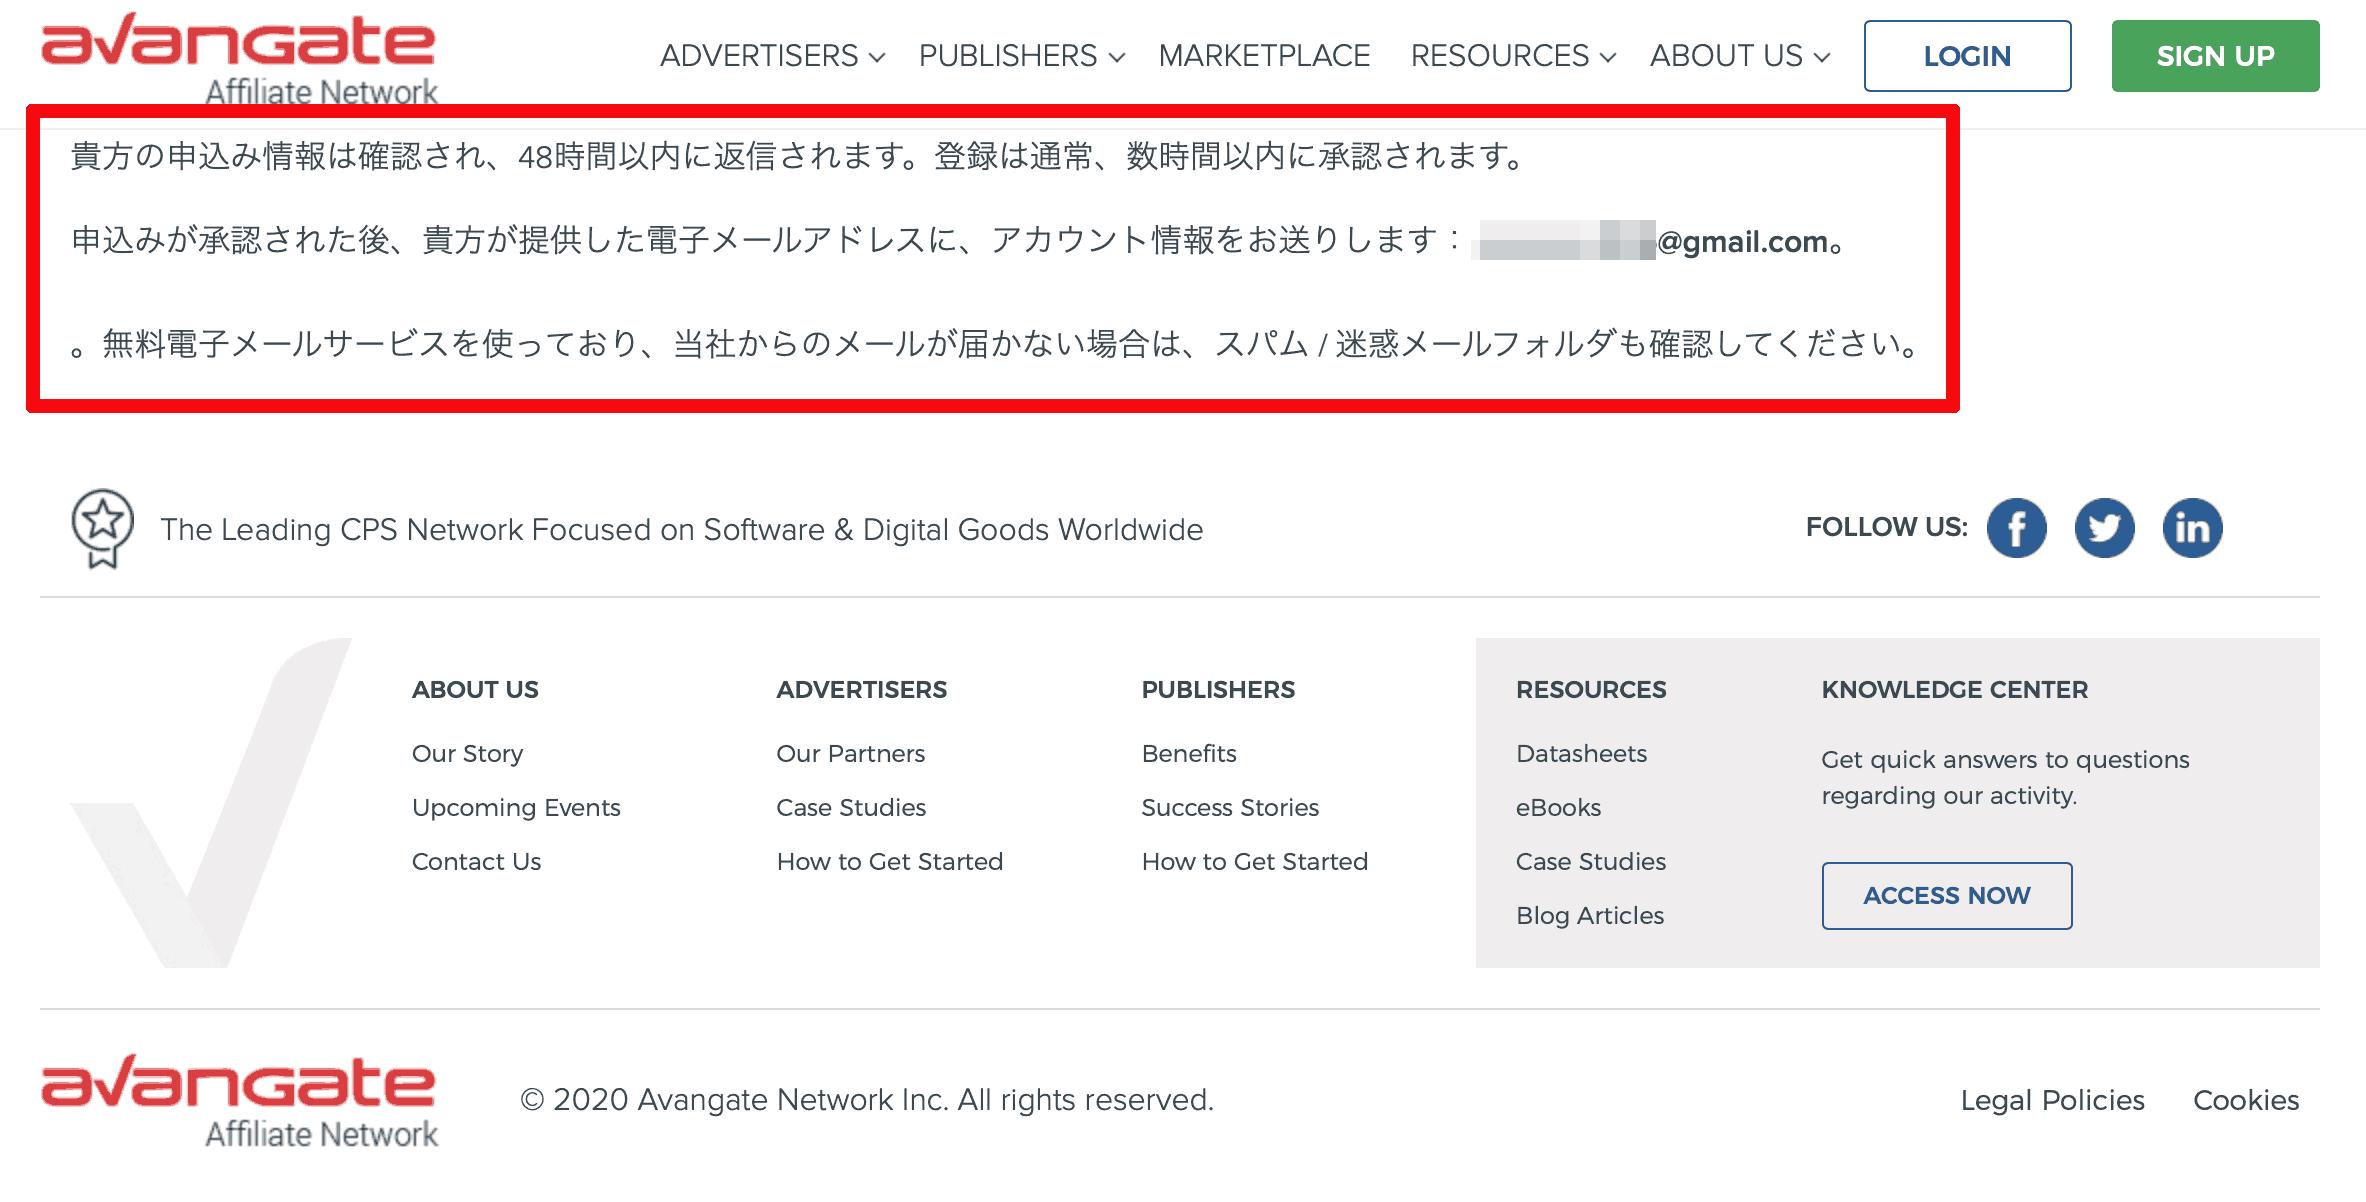 Avangateアカウント登録7